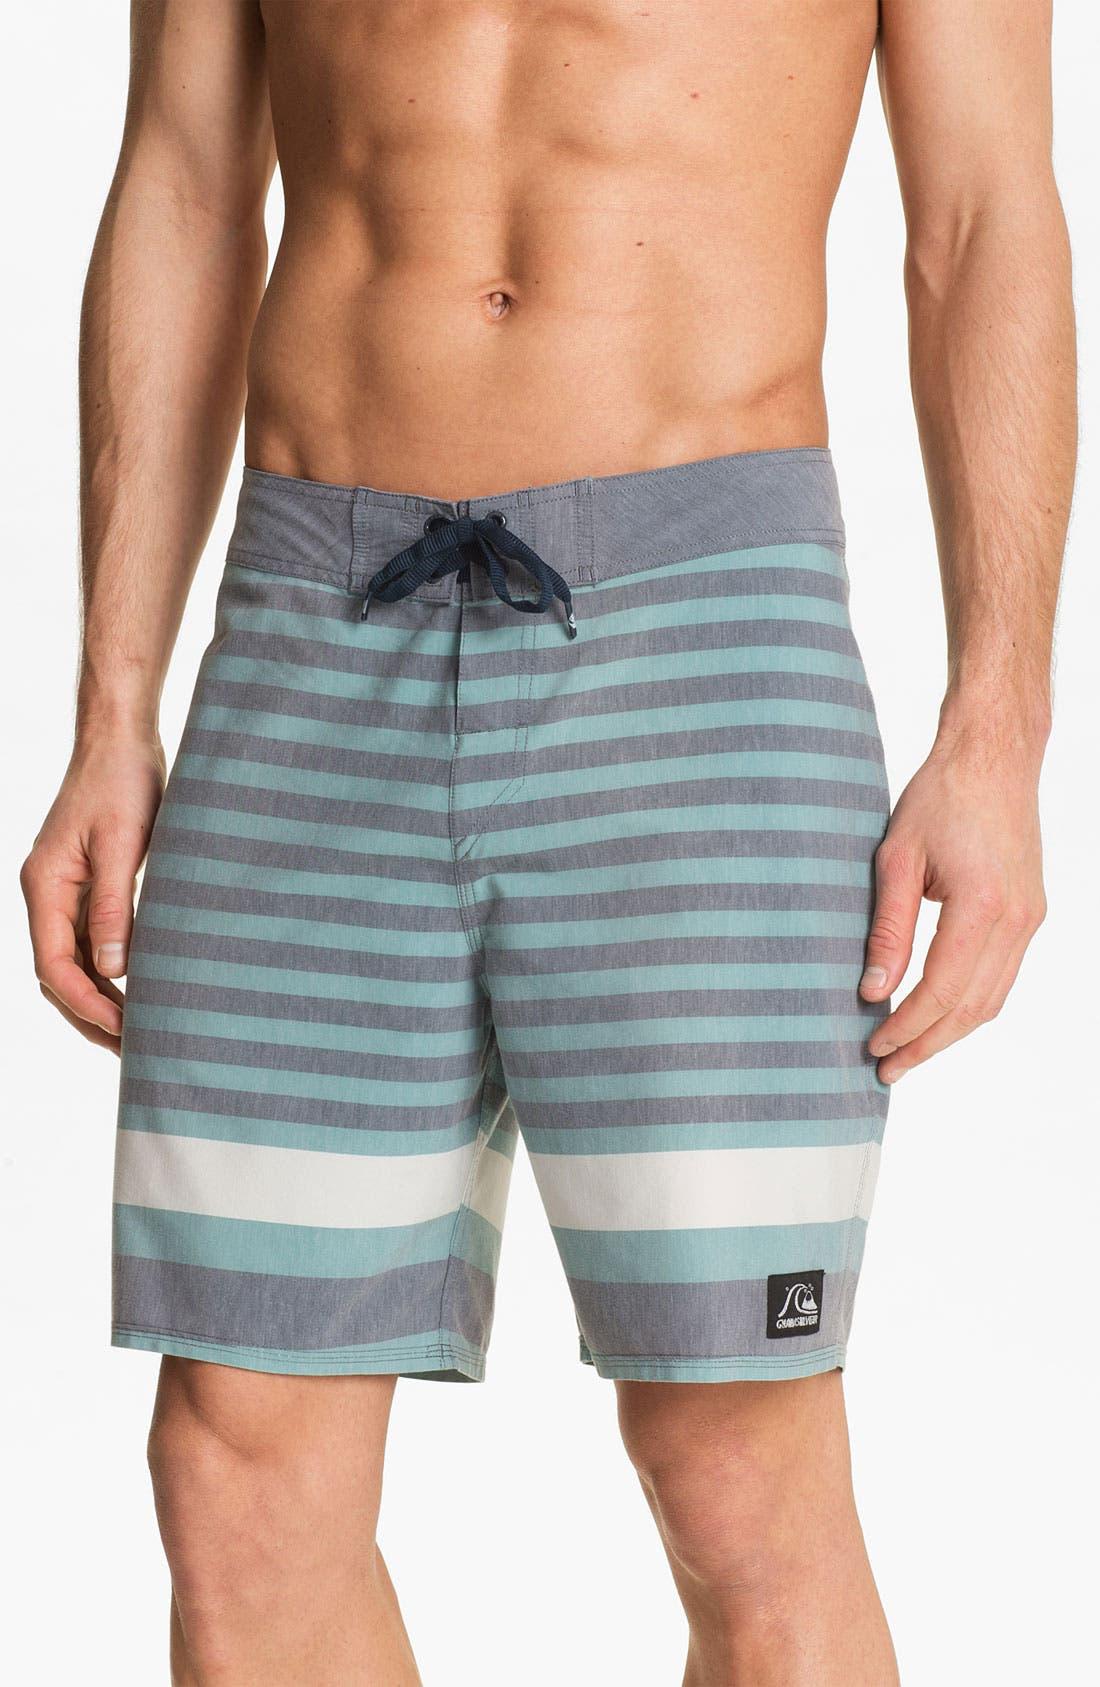 Alternate Image 1 Selected - Quiksilver 'Biarritz' Stripe Board Shorts